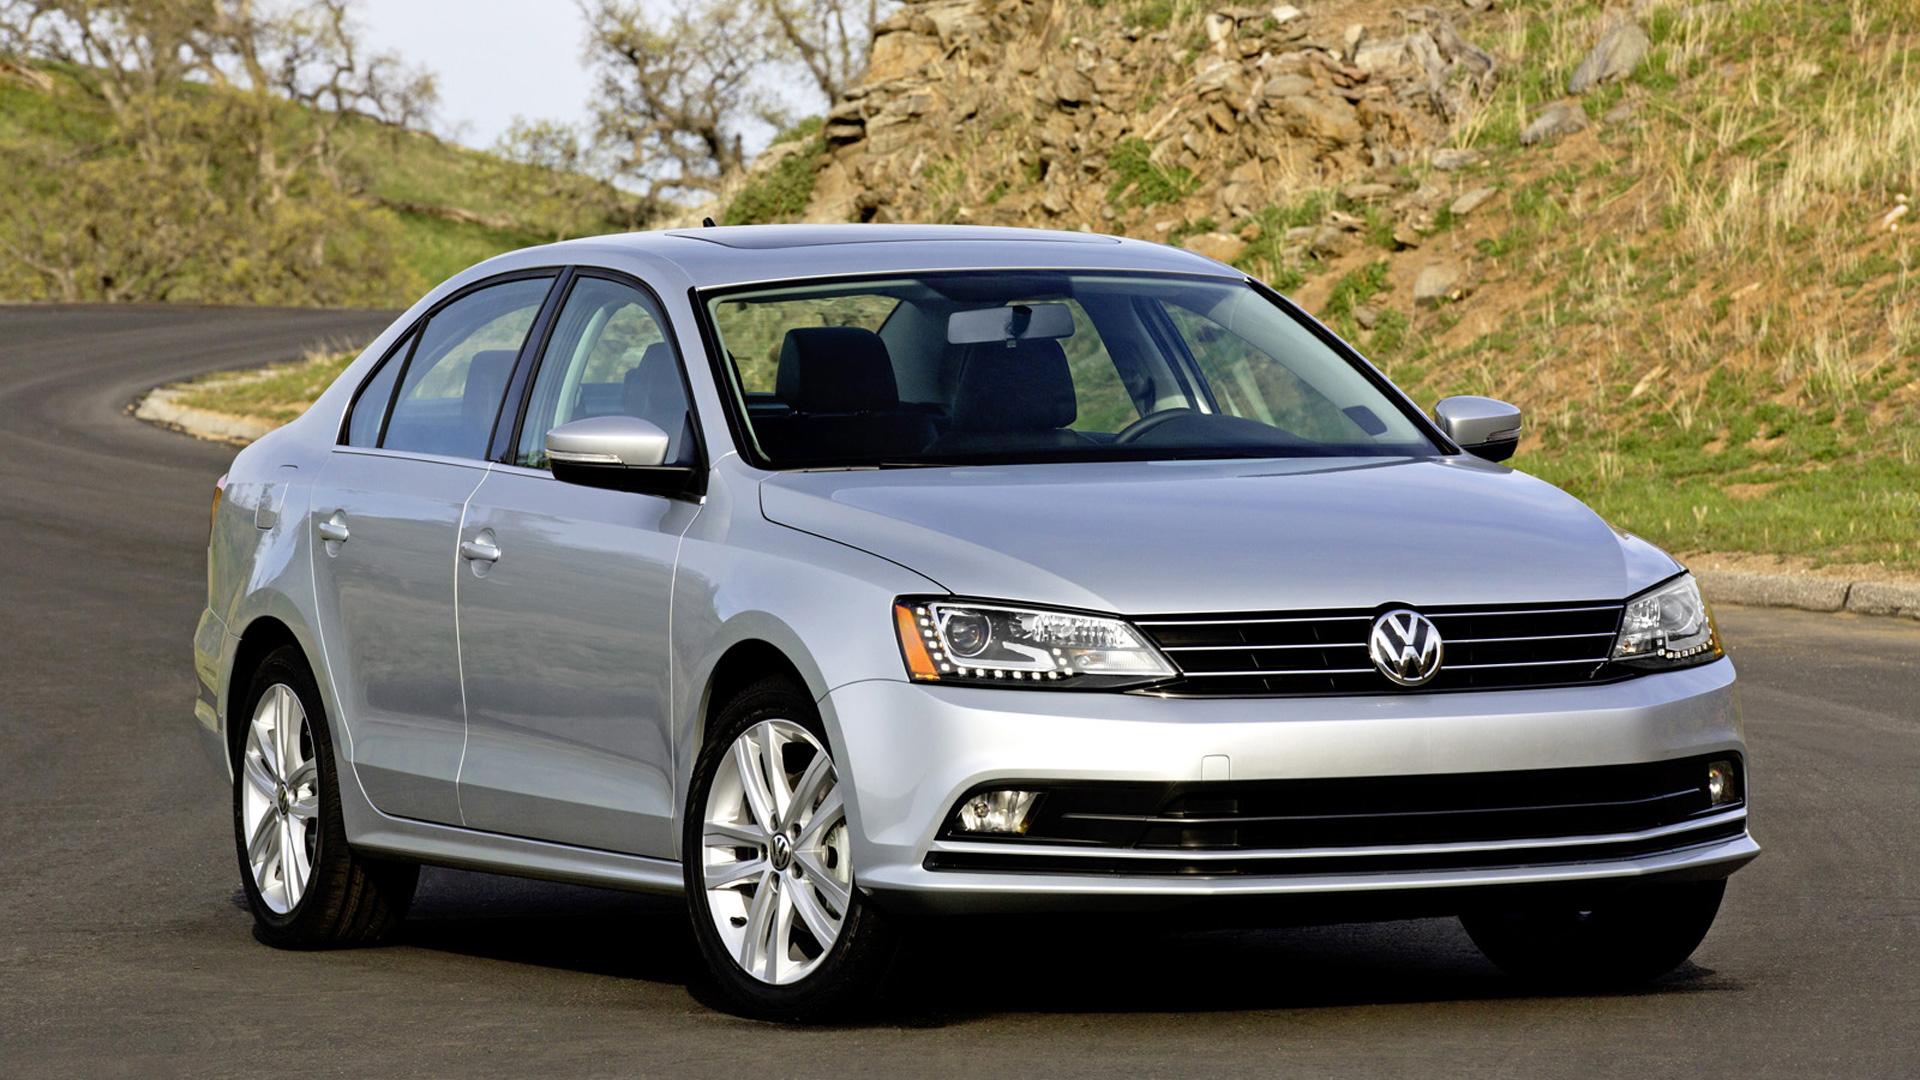 VW Jetta 2015 HD Wallpapers 1920x1080